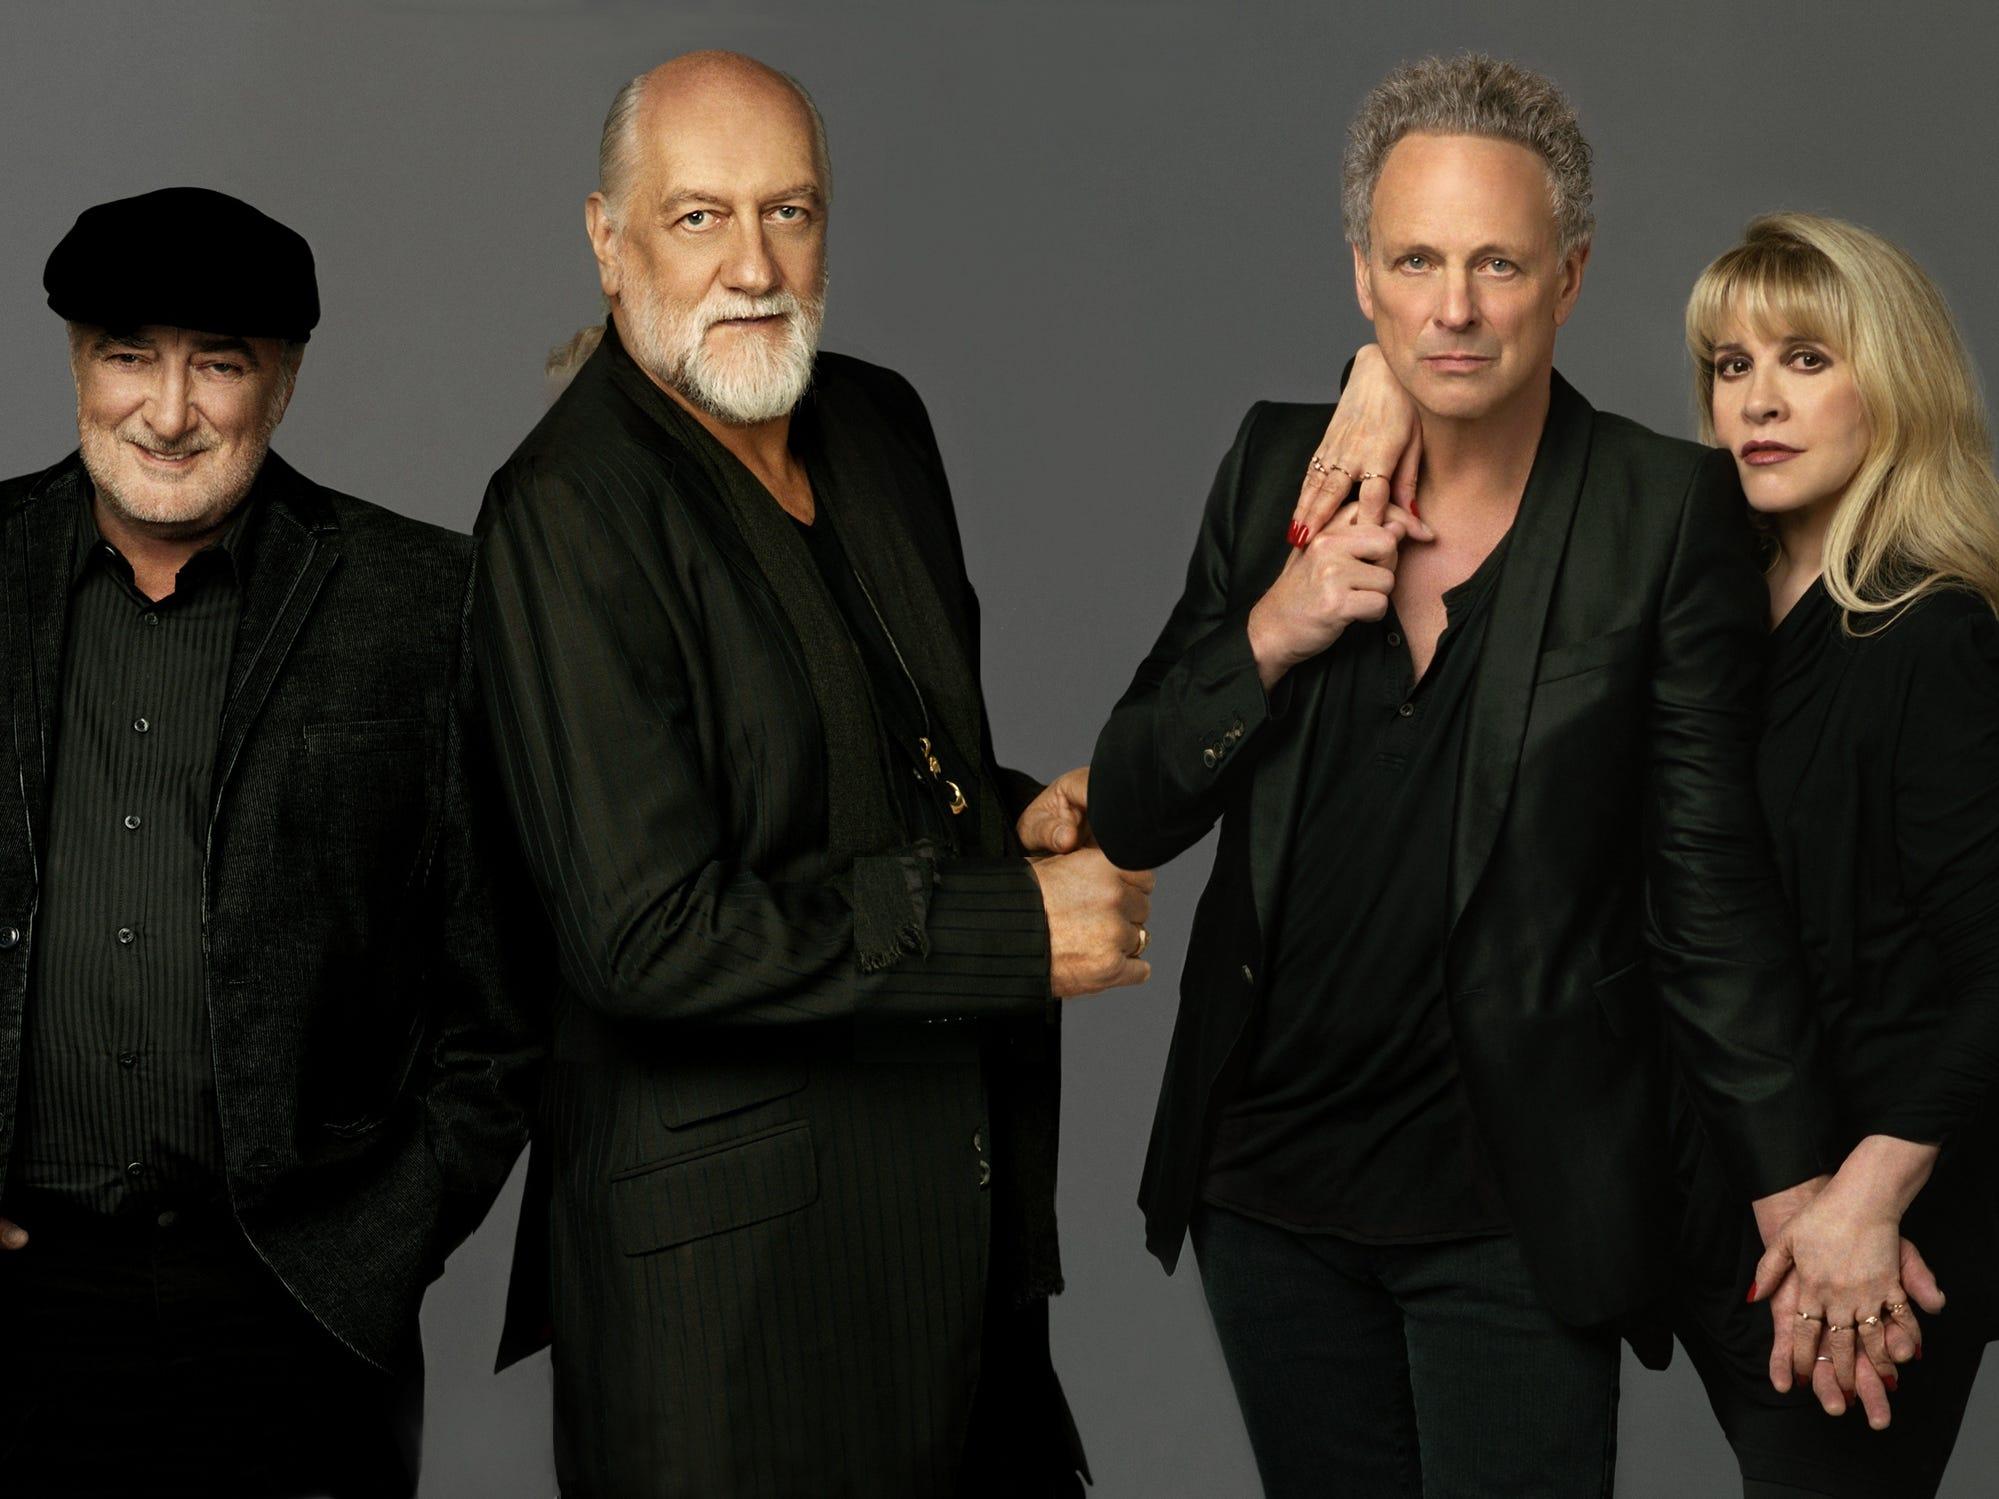 Fleetwood Mac (from left): John McVie, Mick Fleetwood, Lindsey Buckingham and Stevie Nicks.  Credit: .